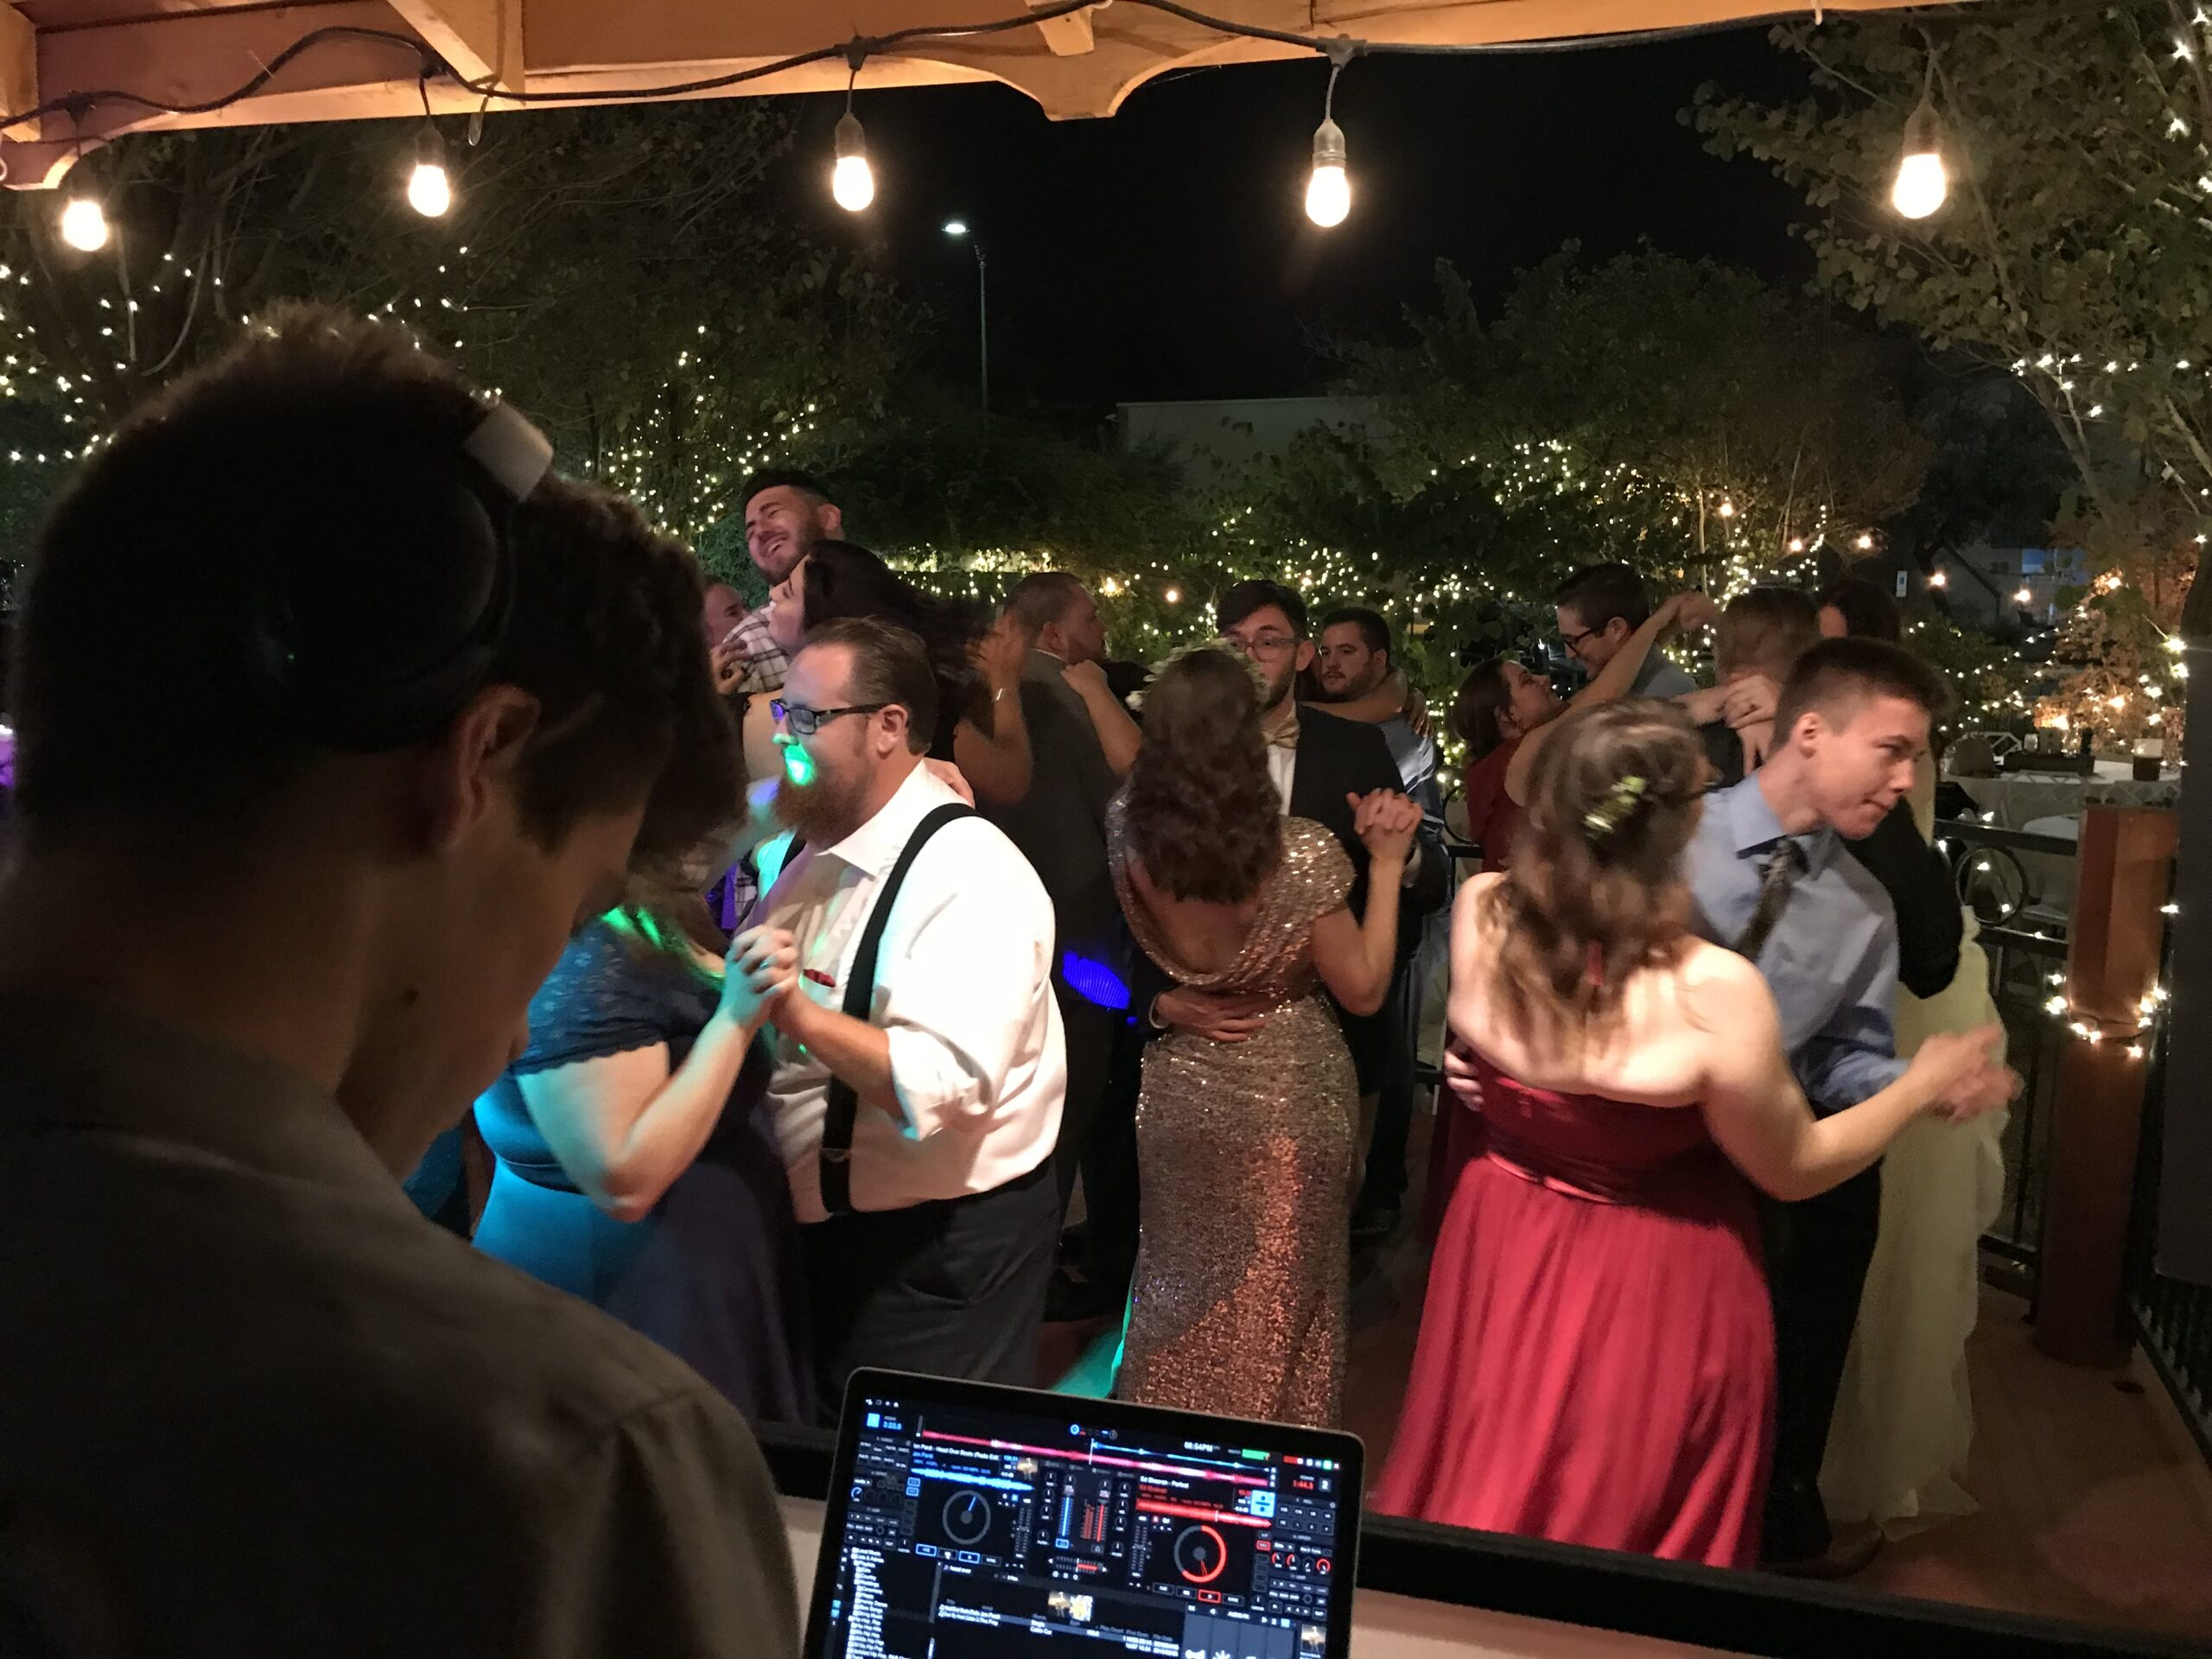 DJ Fine Plays music while crowd dances at wedding